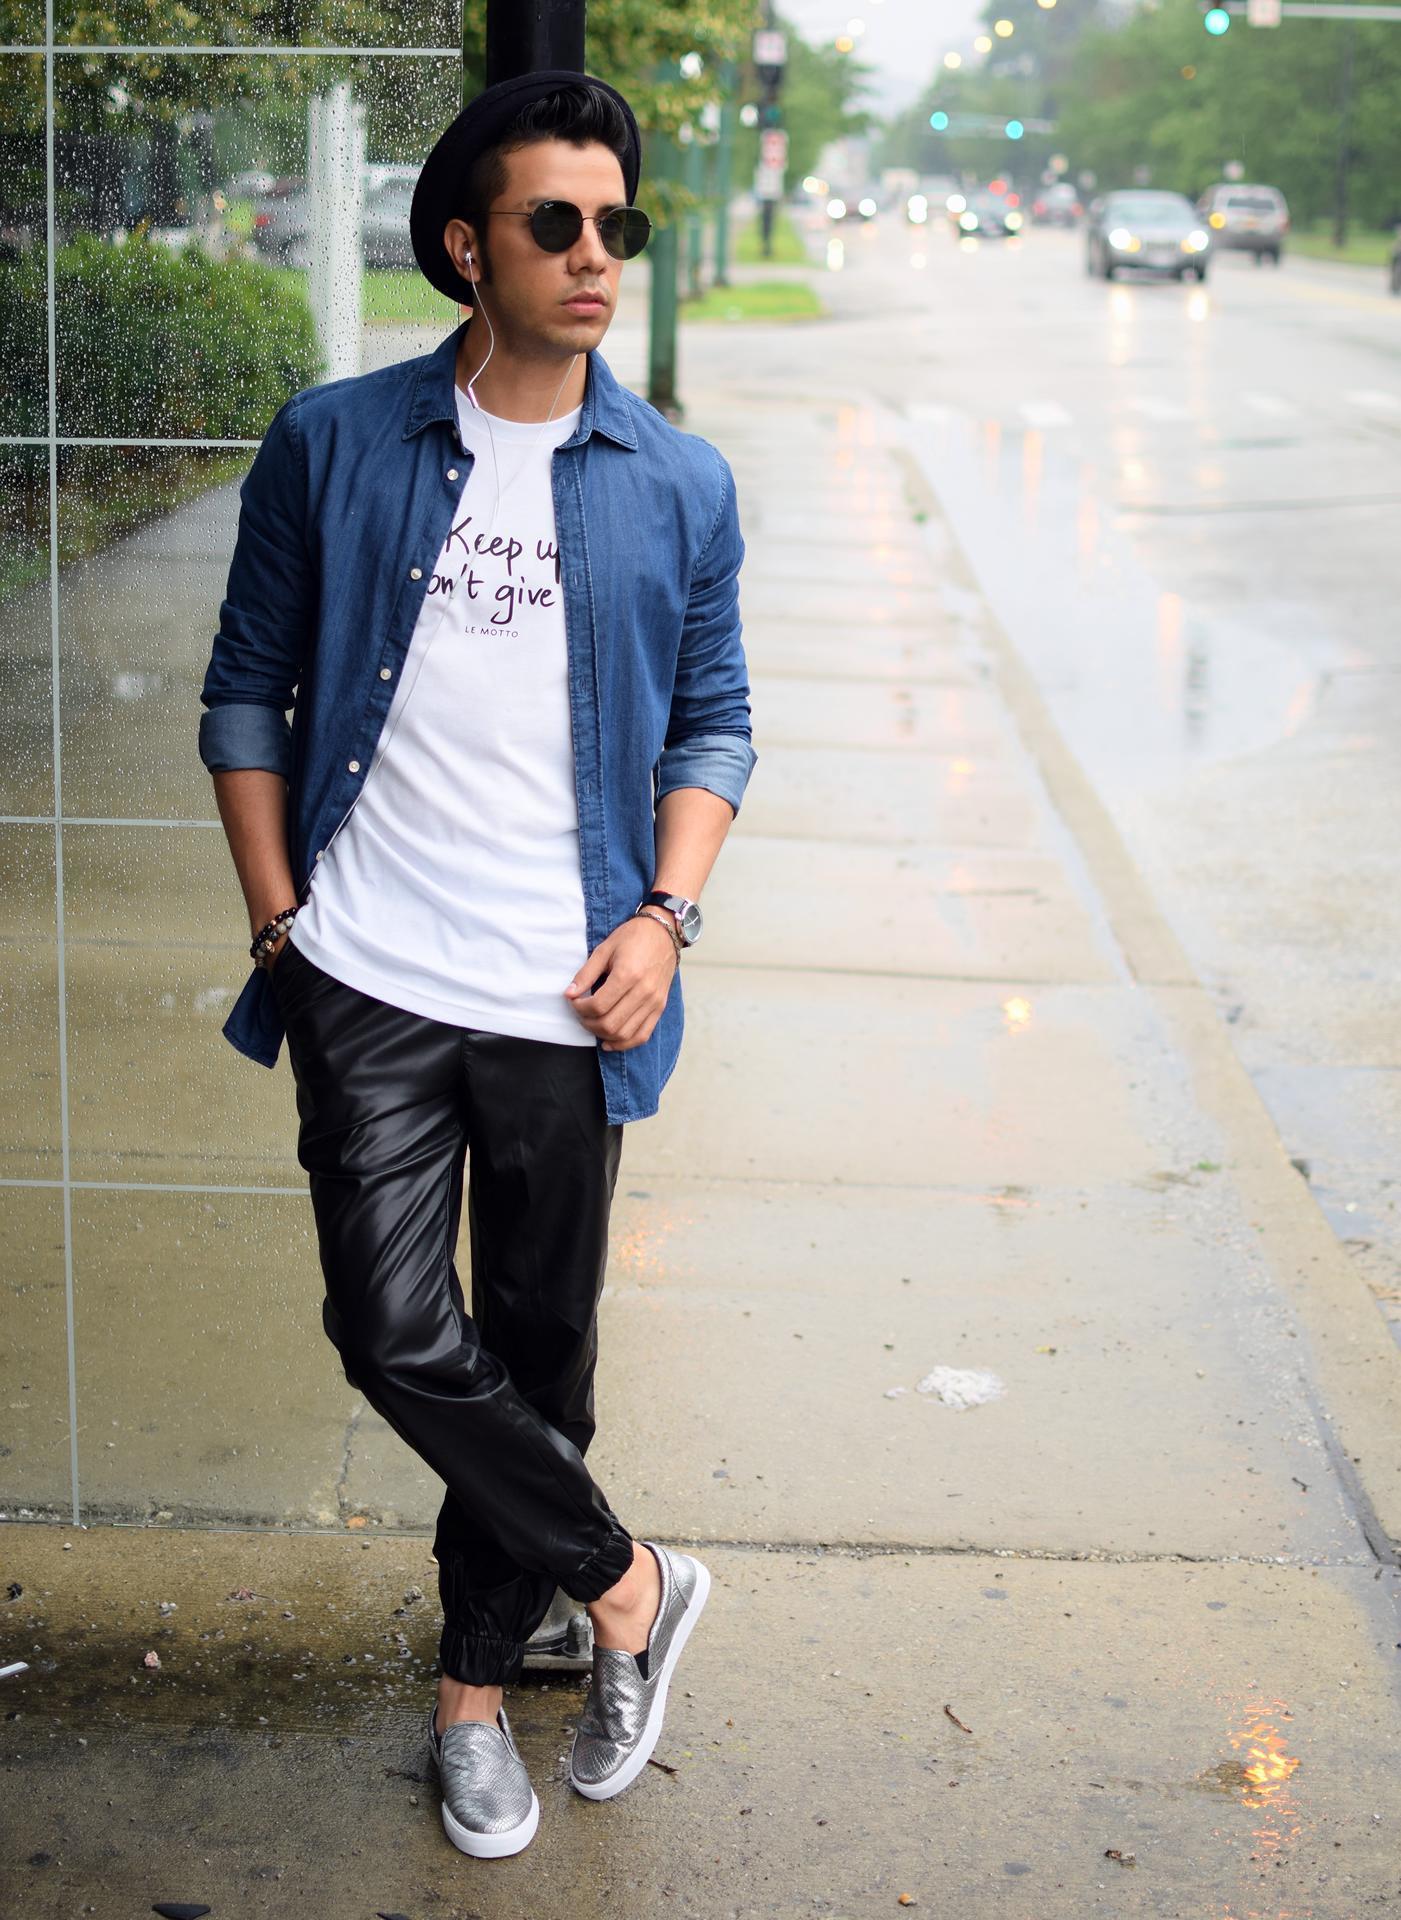 Azul Con Camisa Vaquera Circular Look Moda De Cuello Camiseta IwZxqgAO c5a027043f6b